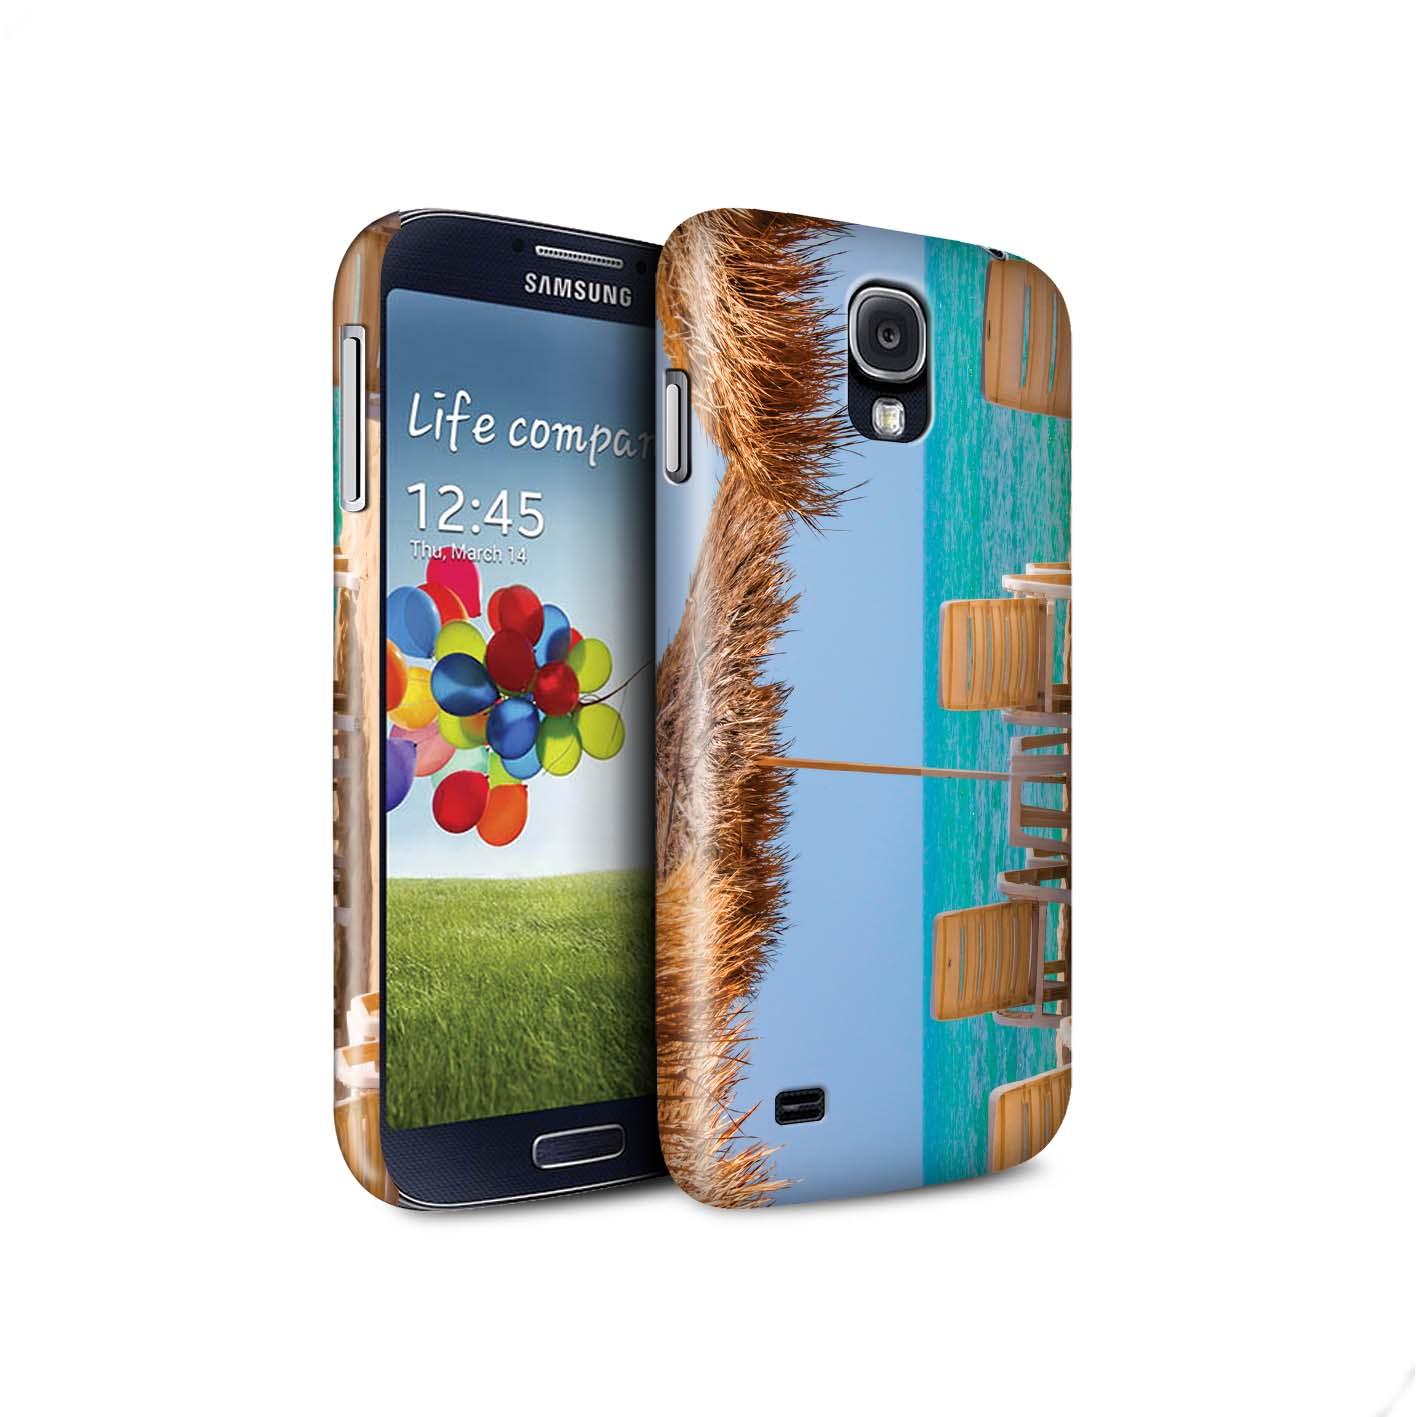 STUFF4-Matte-Phone-Case-for-Samsung-Galaxy-S4-SIV-Thailand-Scenery